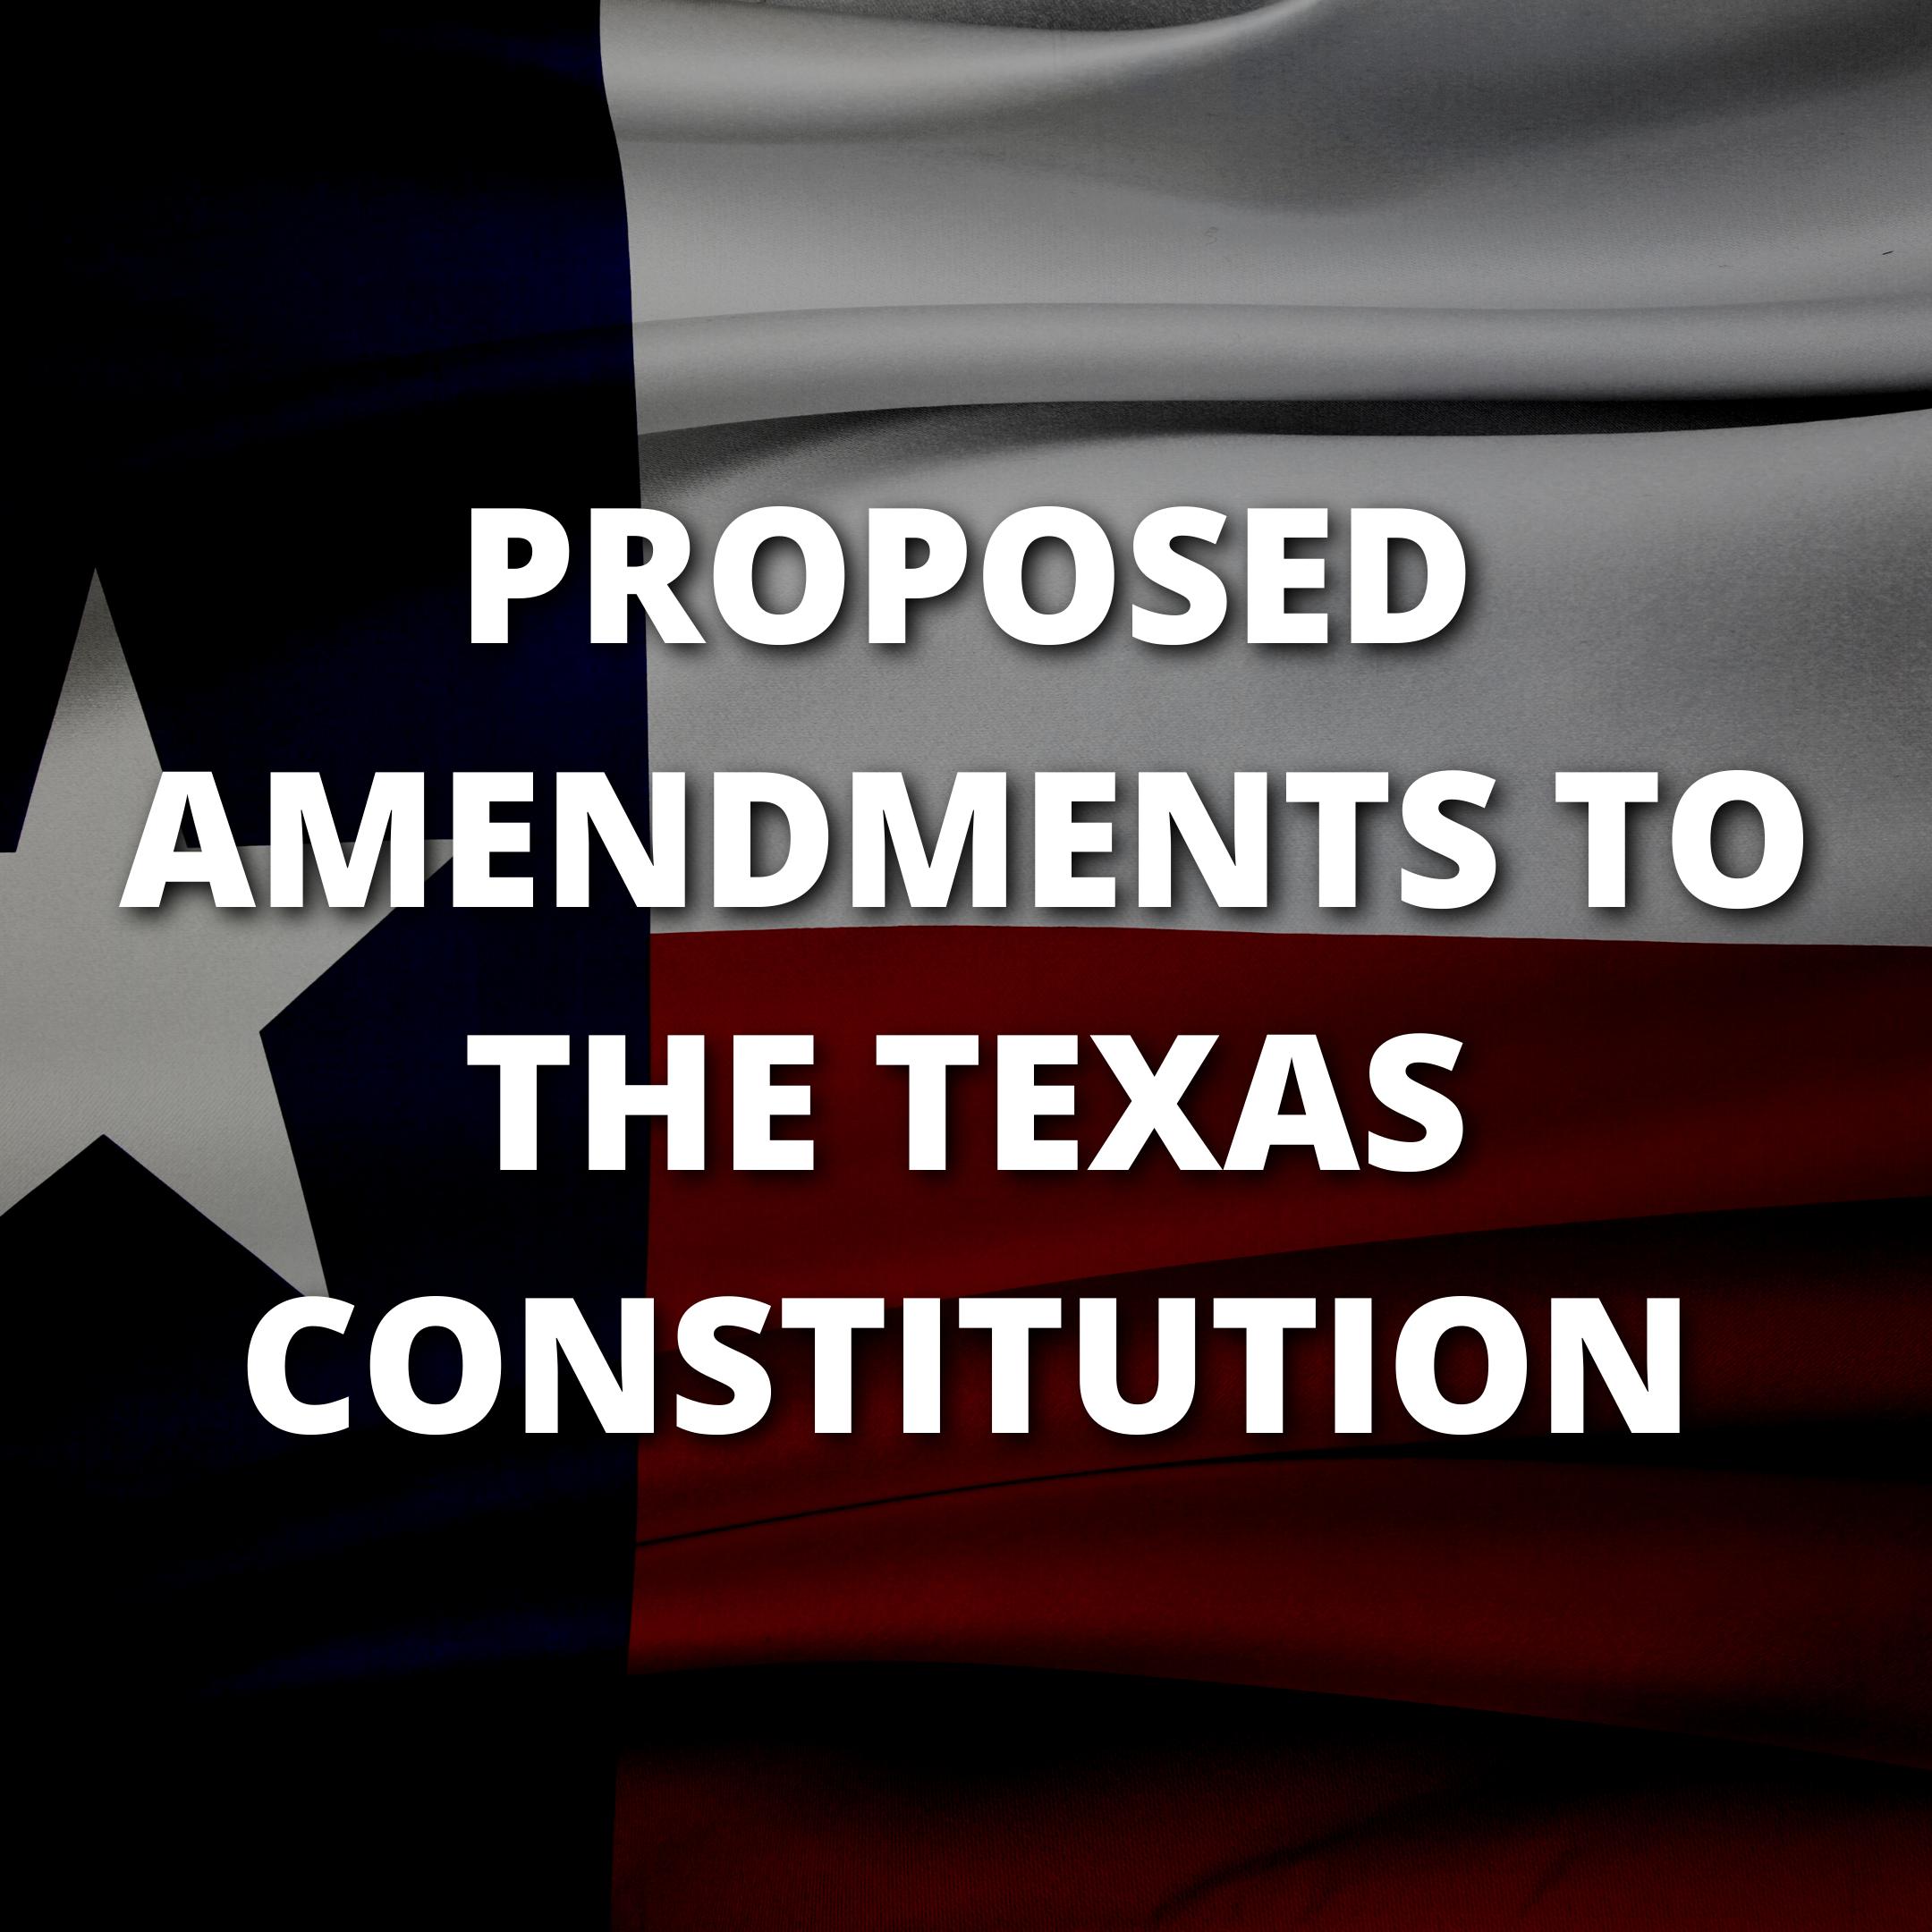 Proposed 2021 Texas Constitutional Amendments